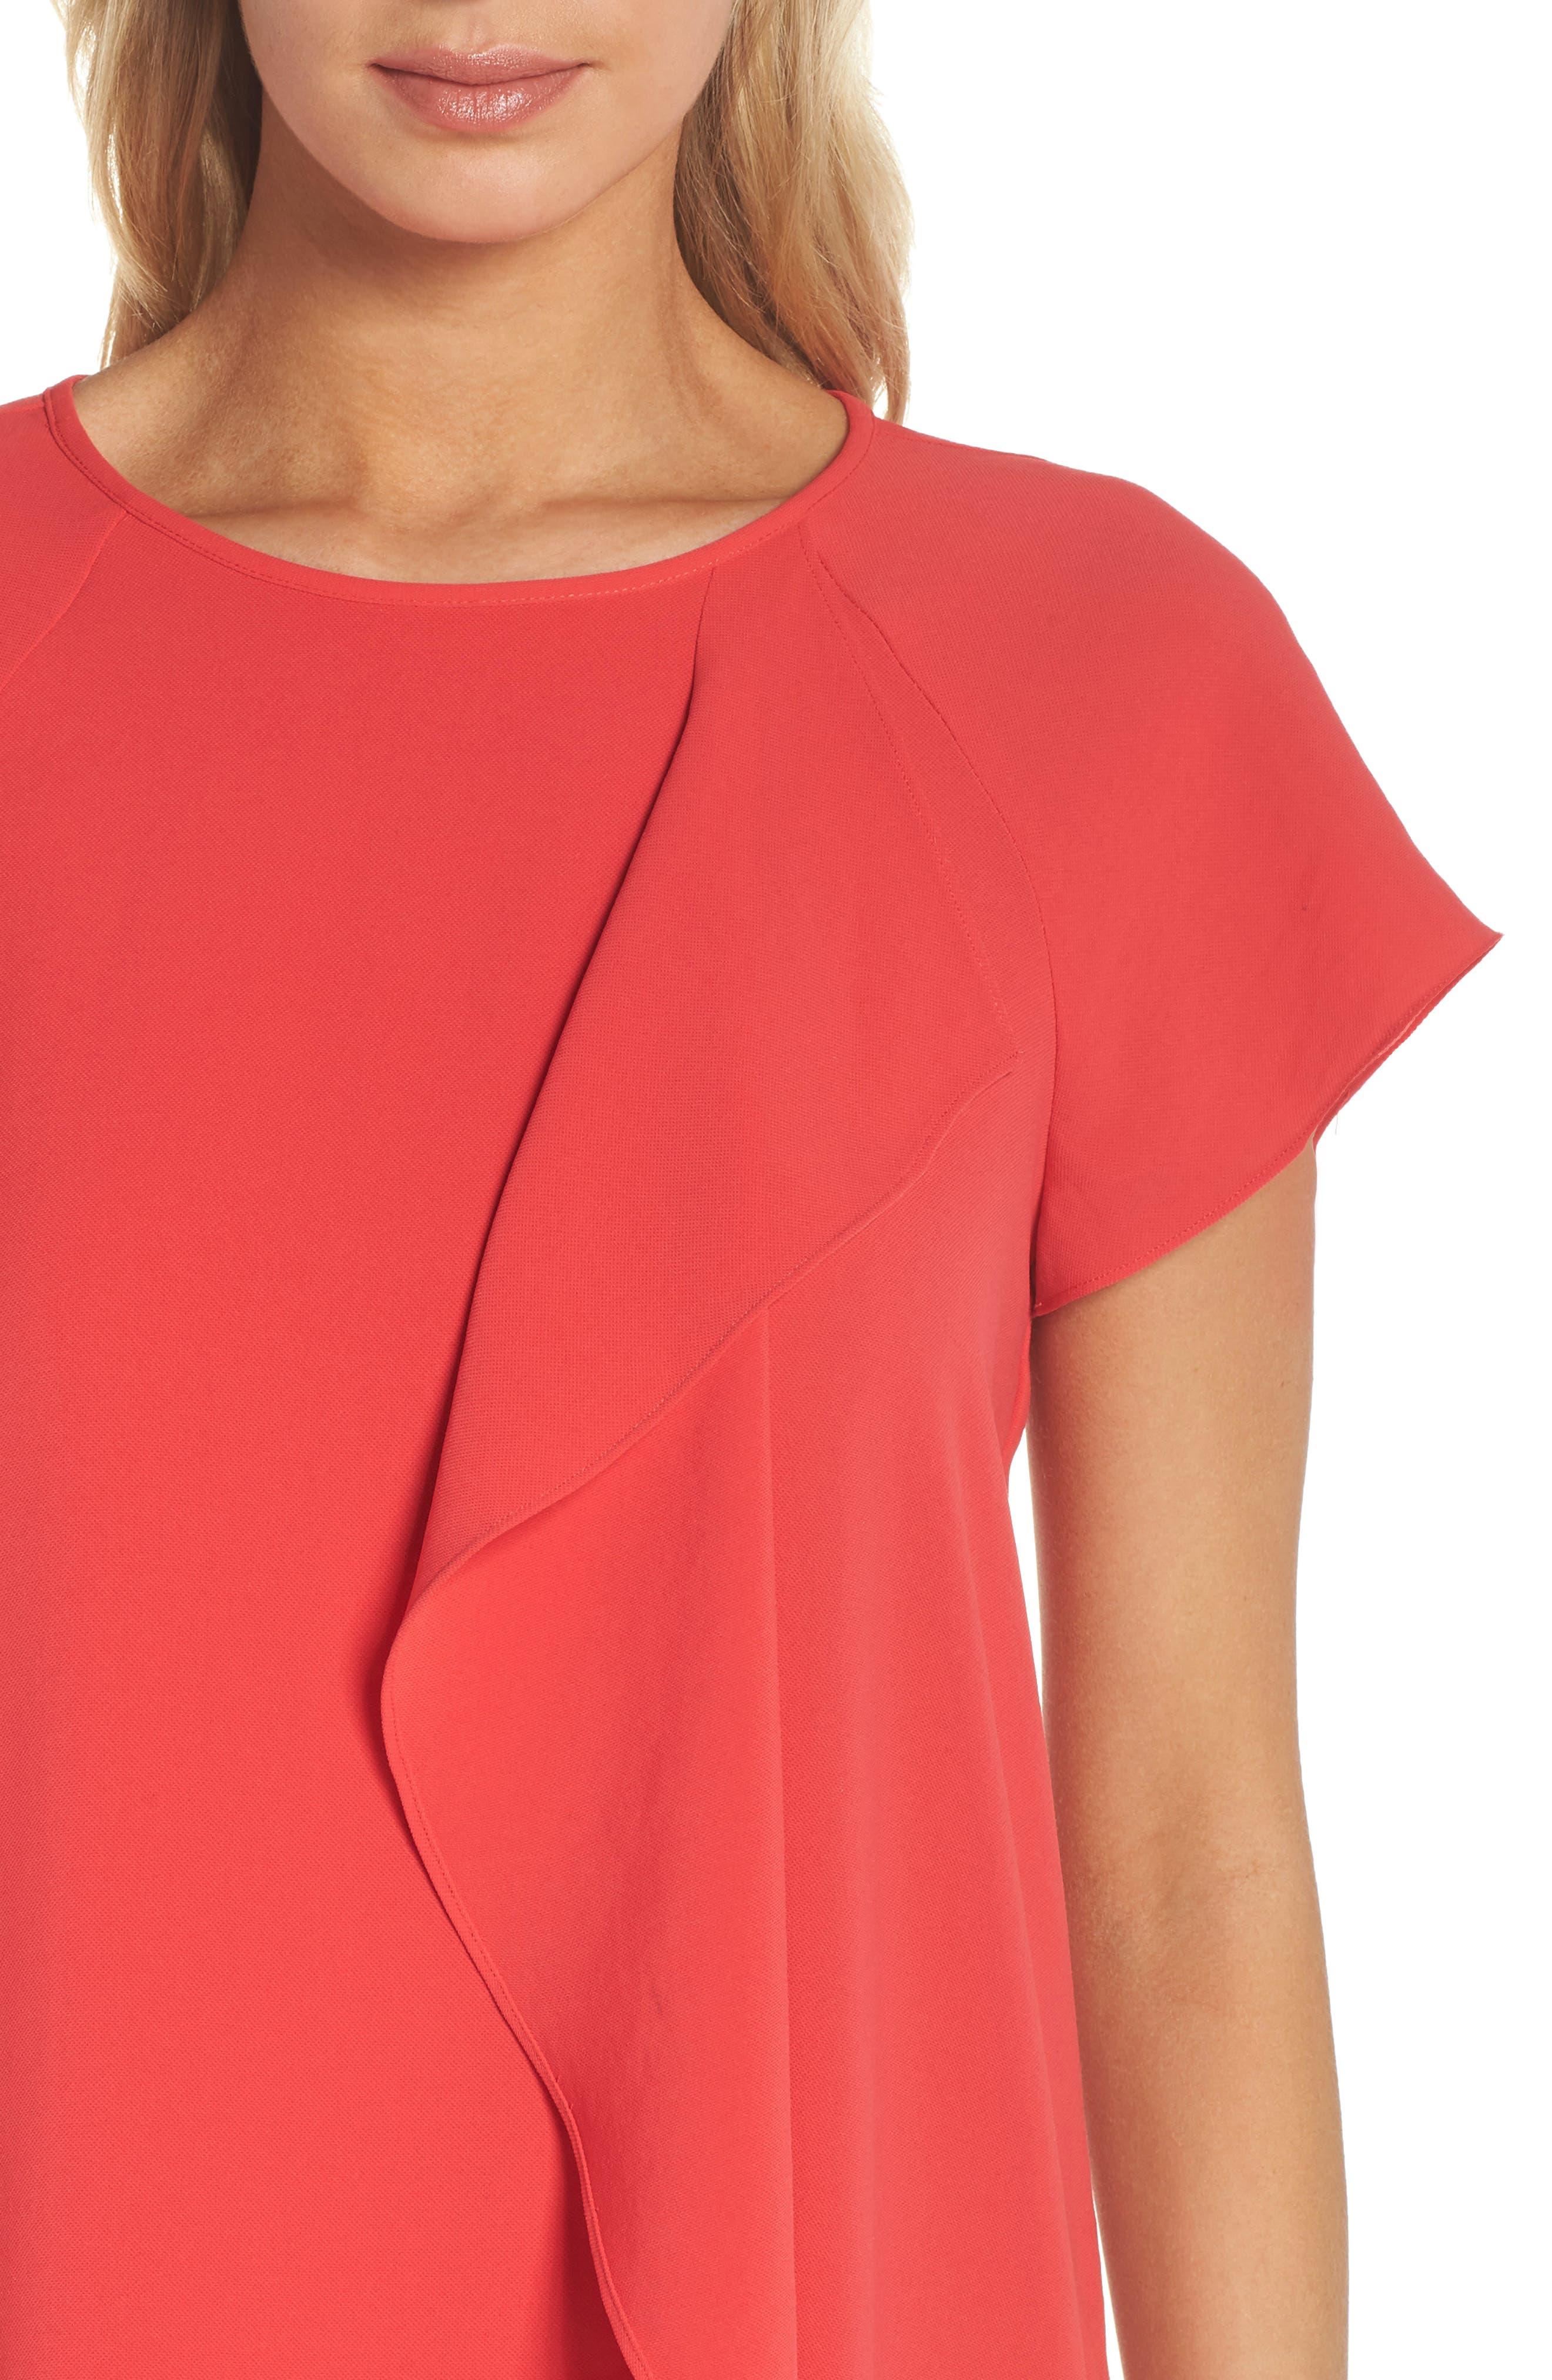 ADRIANNA PAPELL, Crepe Shift Dress, Alternate thumbnail 5, color, 650